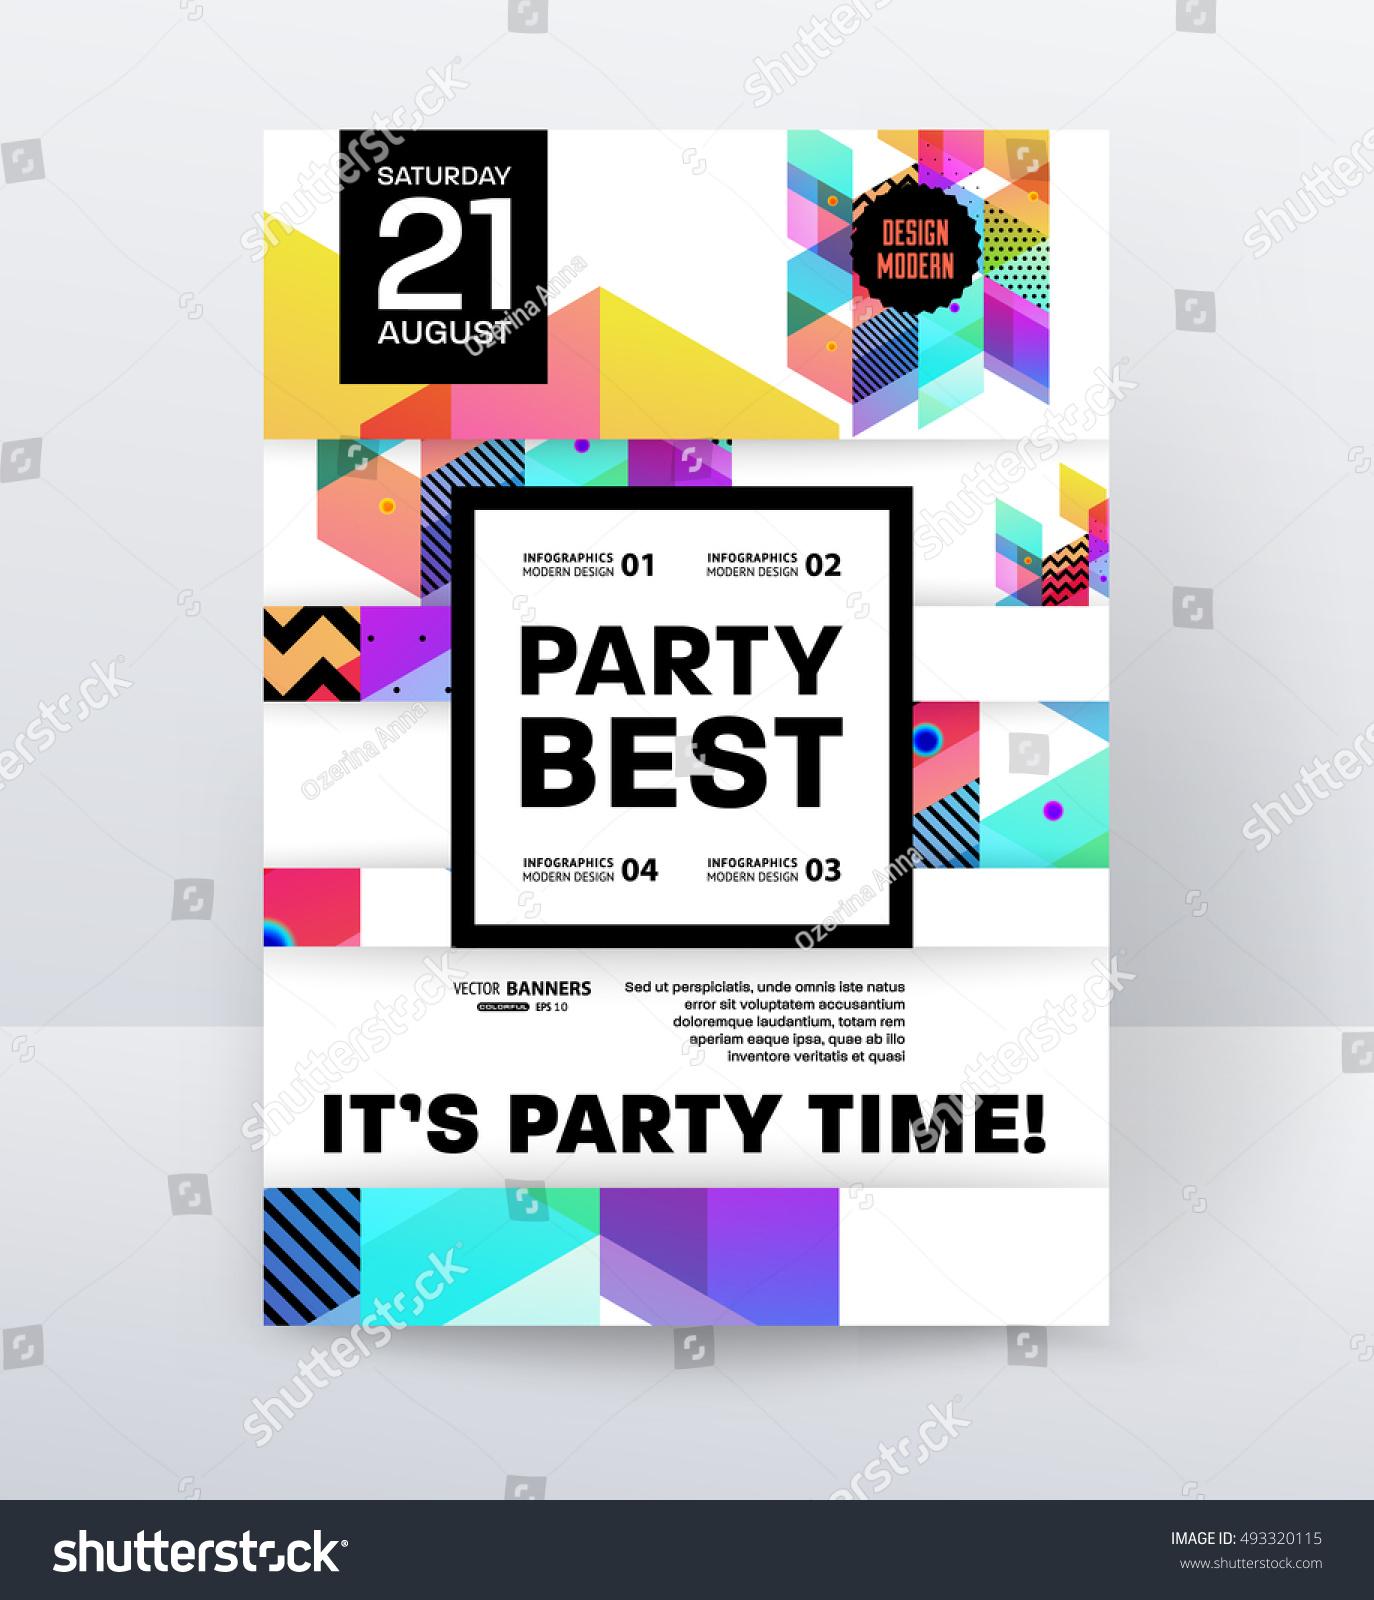 Groß Party Poster Vorlage Bilder - Entry Level Resume Vorlagen ...